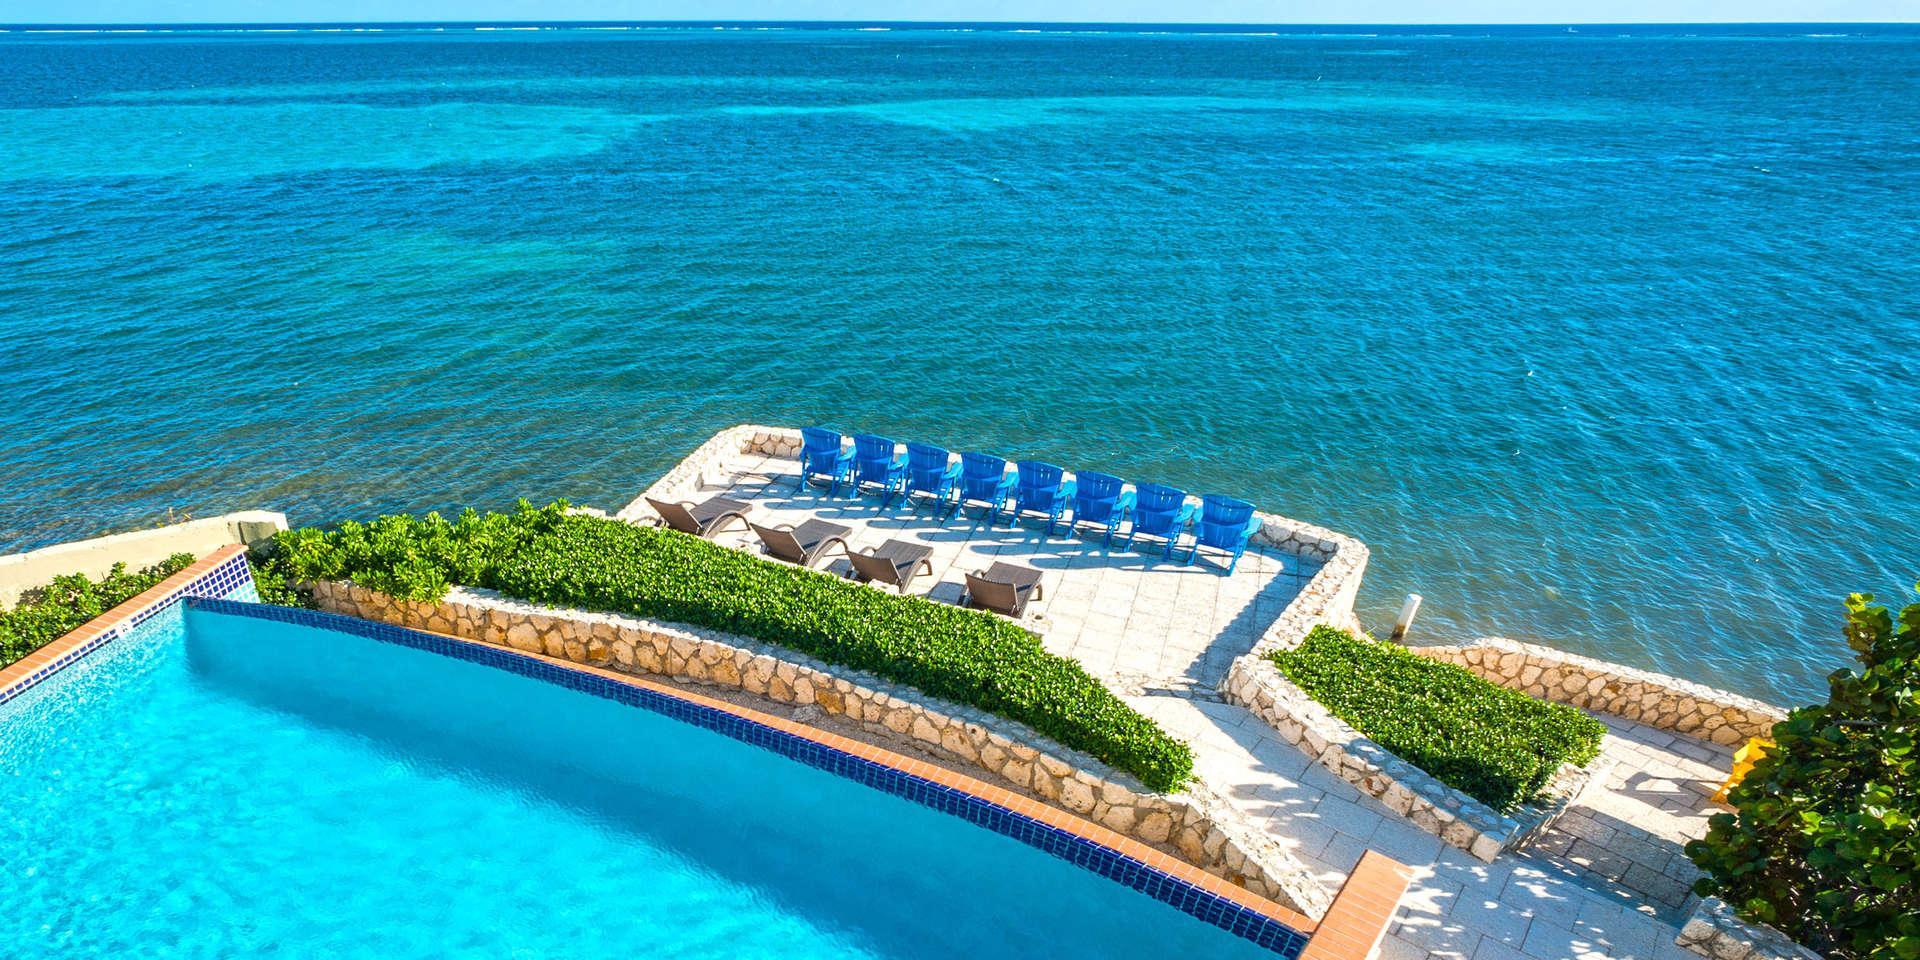 Luxury villa rentals caribbean - Cayman islands - Grand cayman - East end - Cayman Castle Villa - Image 1/27